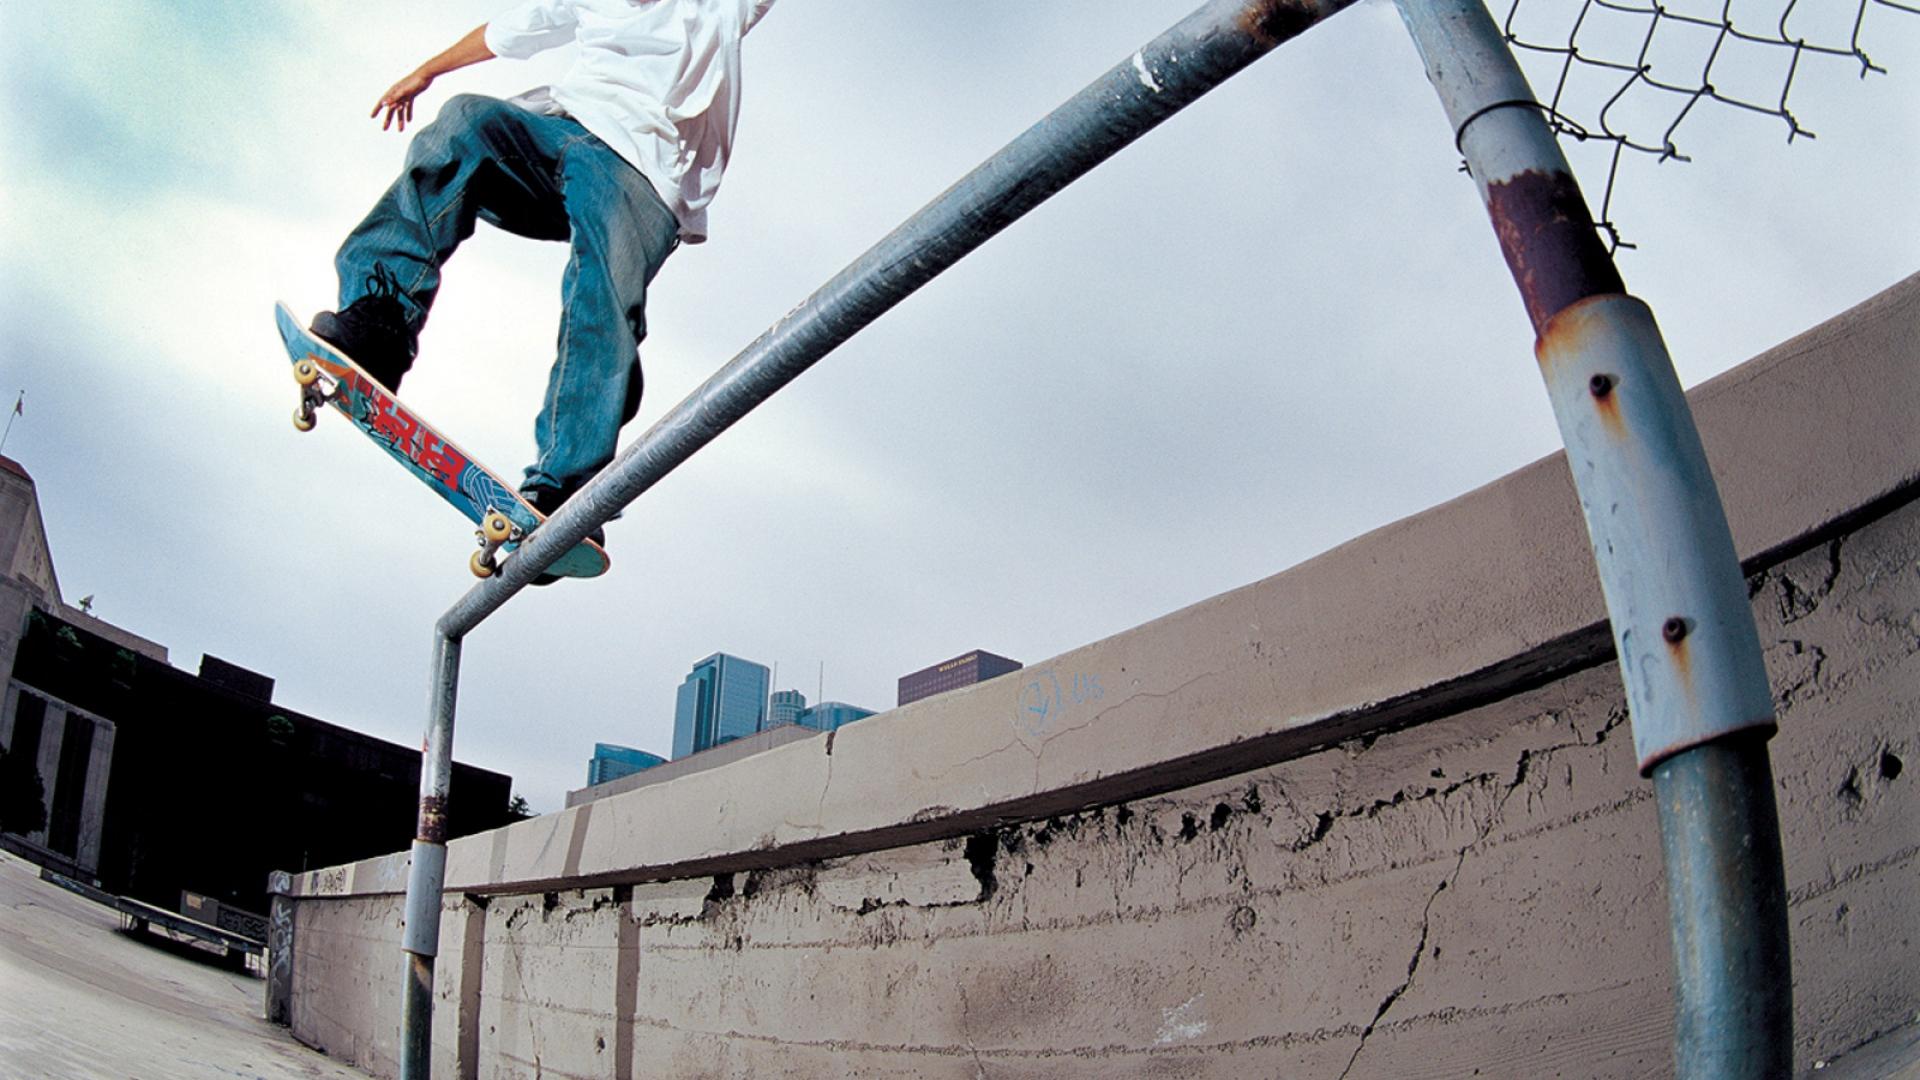 Download Wallpaper 1920x1080 Bryan Wenning Handrail Skateboard Board Trick Full Hd 1080p Hd Background